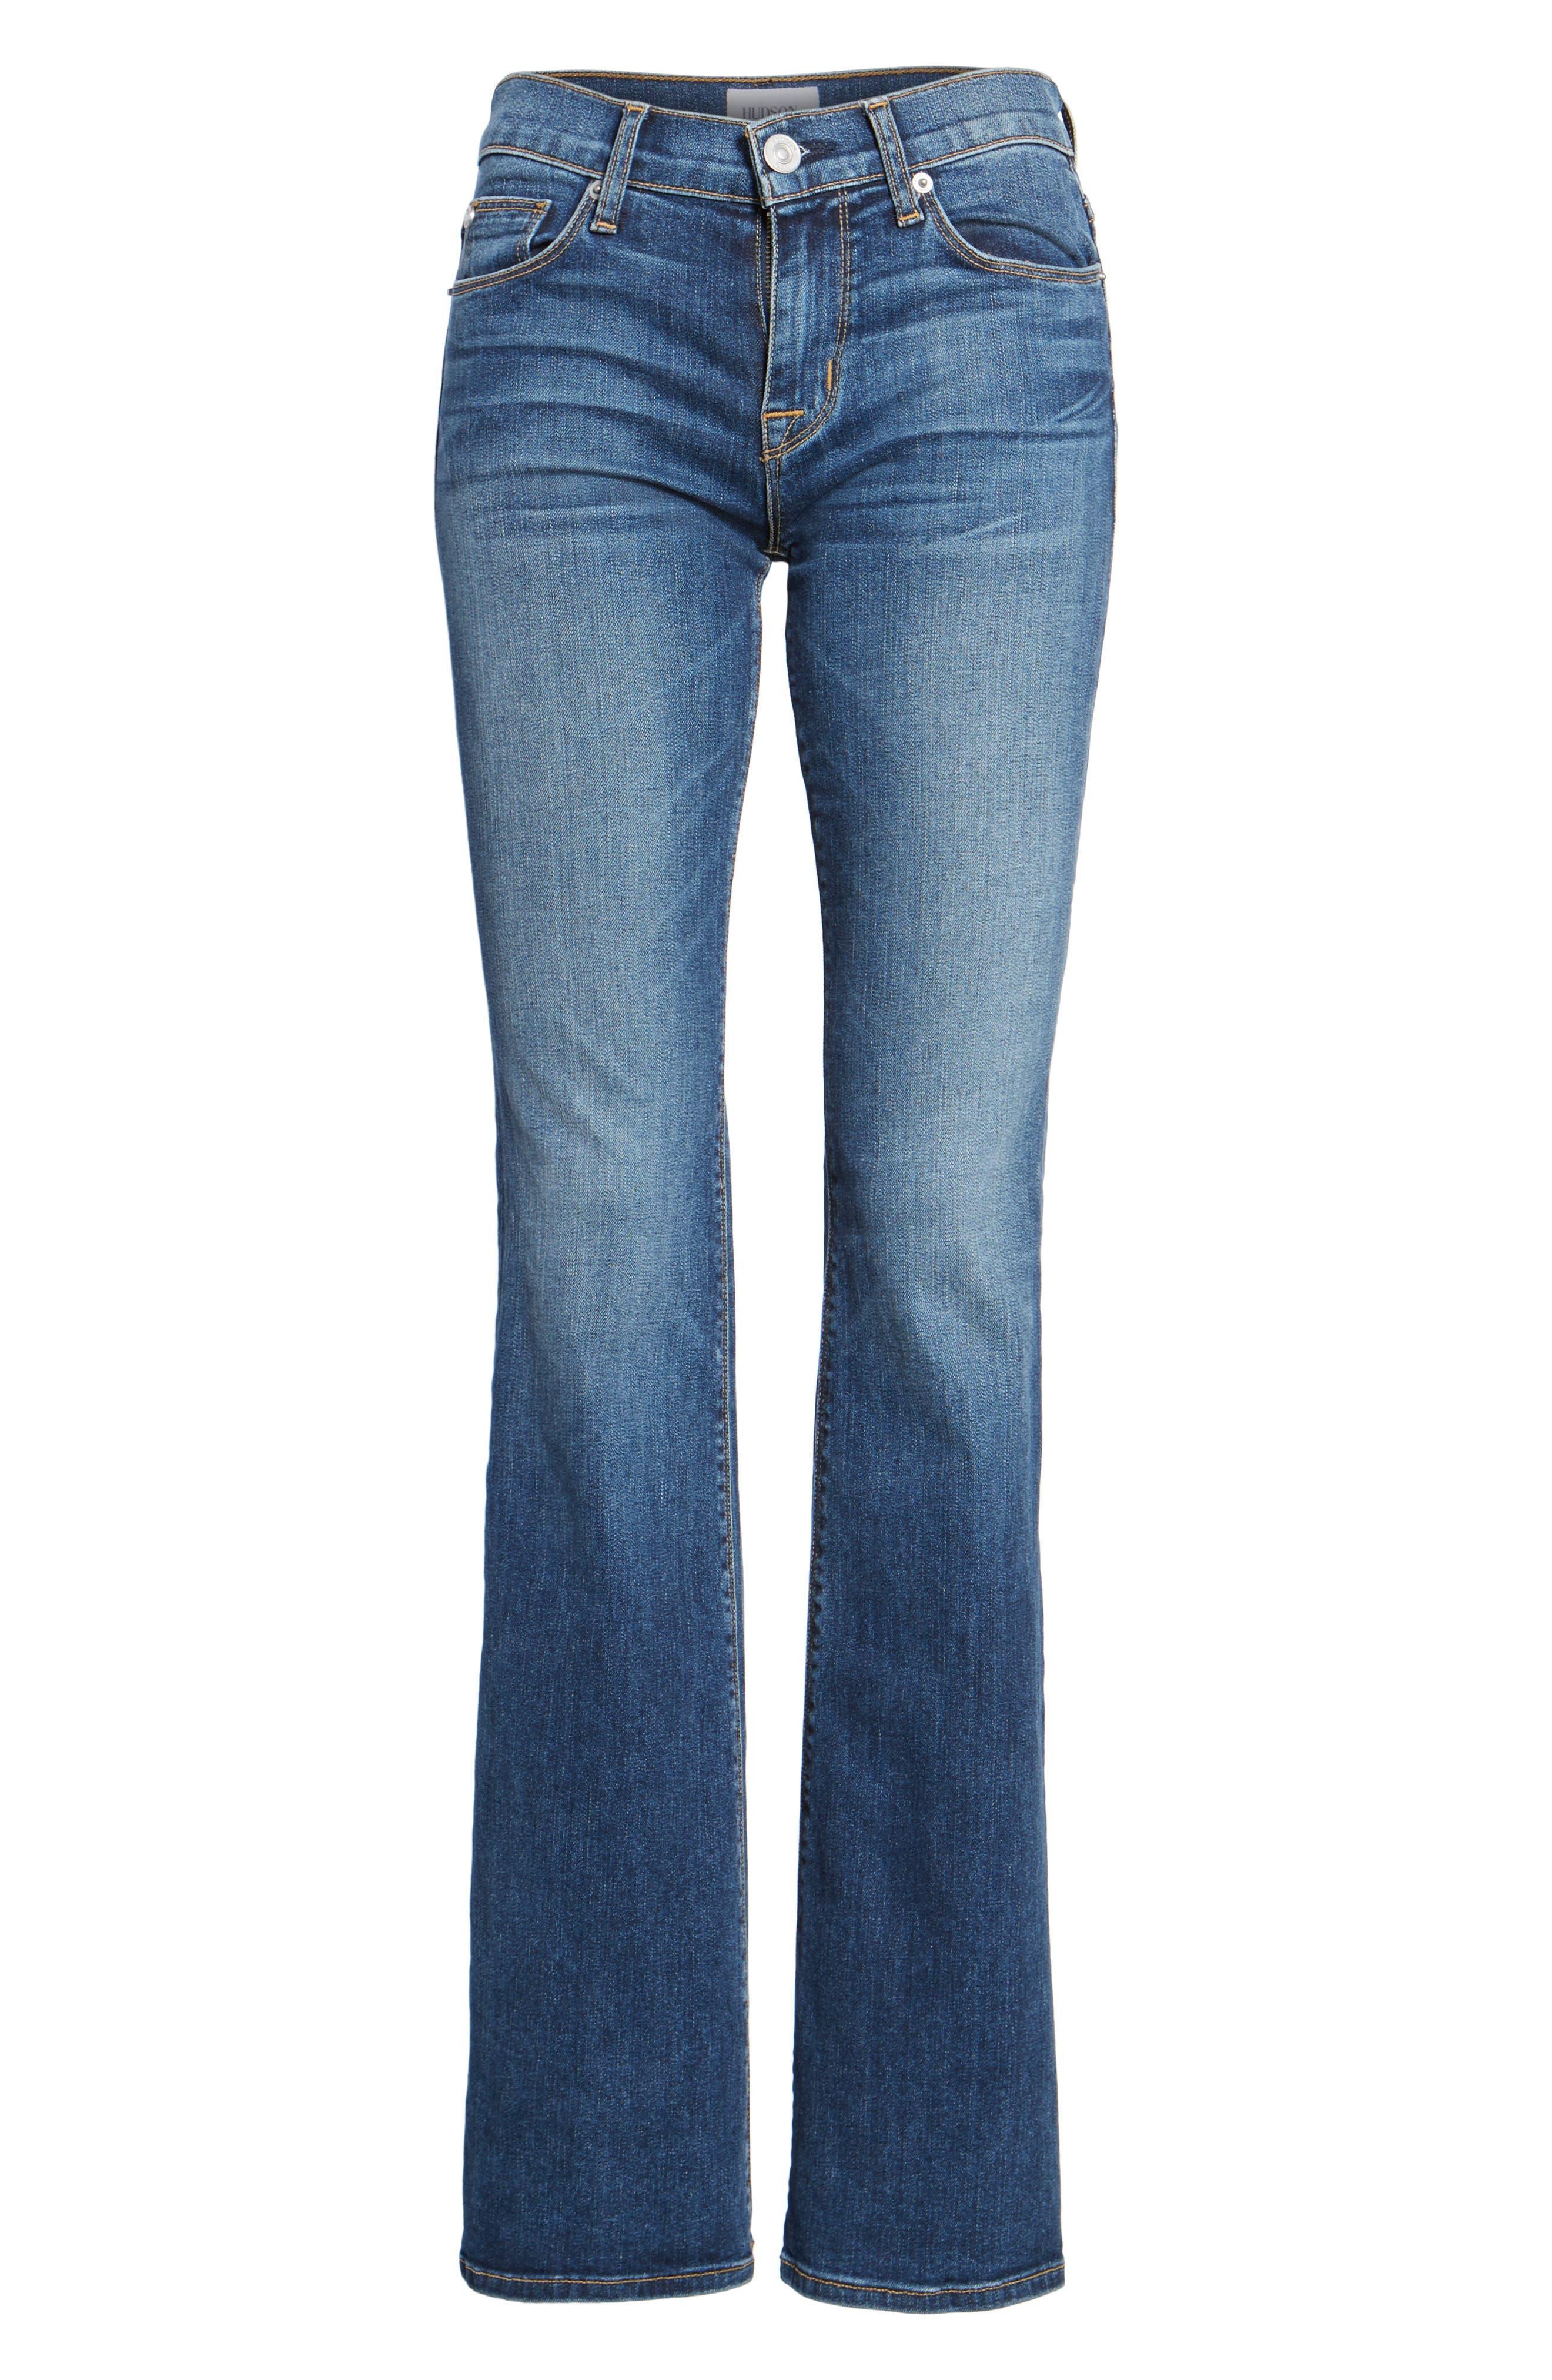 Drew Bootcut Jeans,                             Alternate thumbnail 7, color,                             UNFAMED